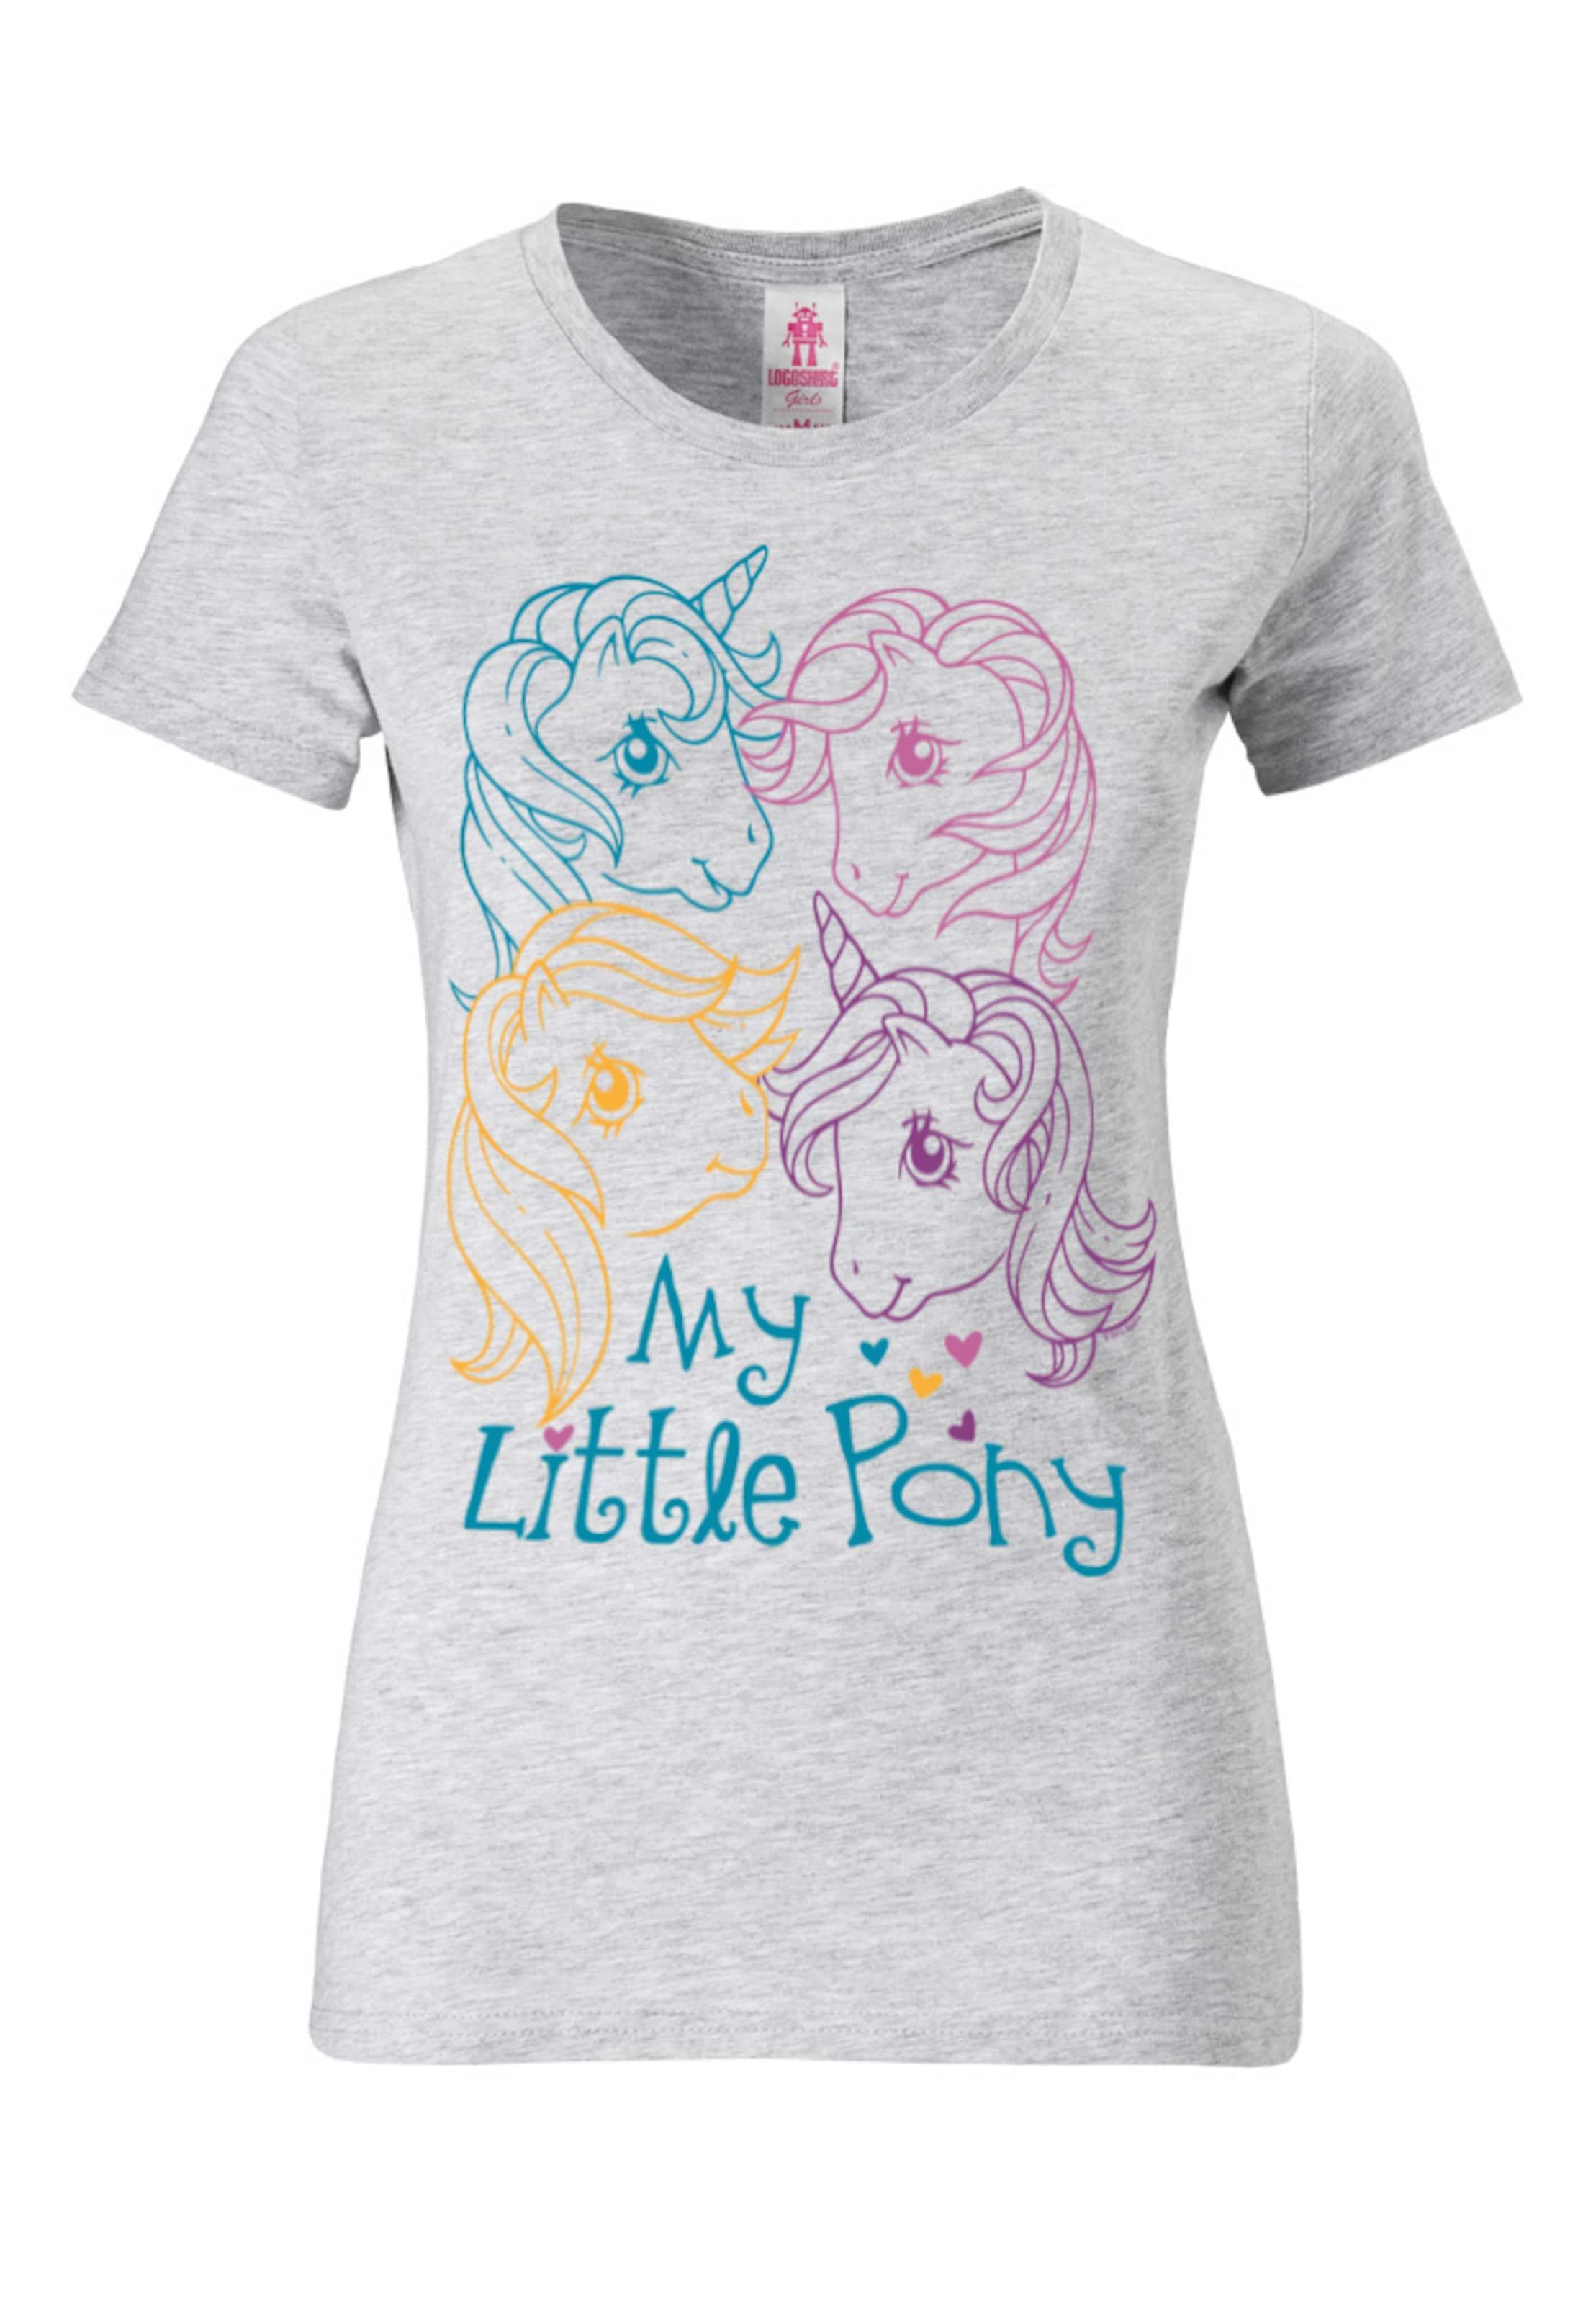 Pony' Logoshirt Little T shirt 'my Hellgrau In PXOZiulwTk